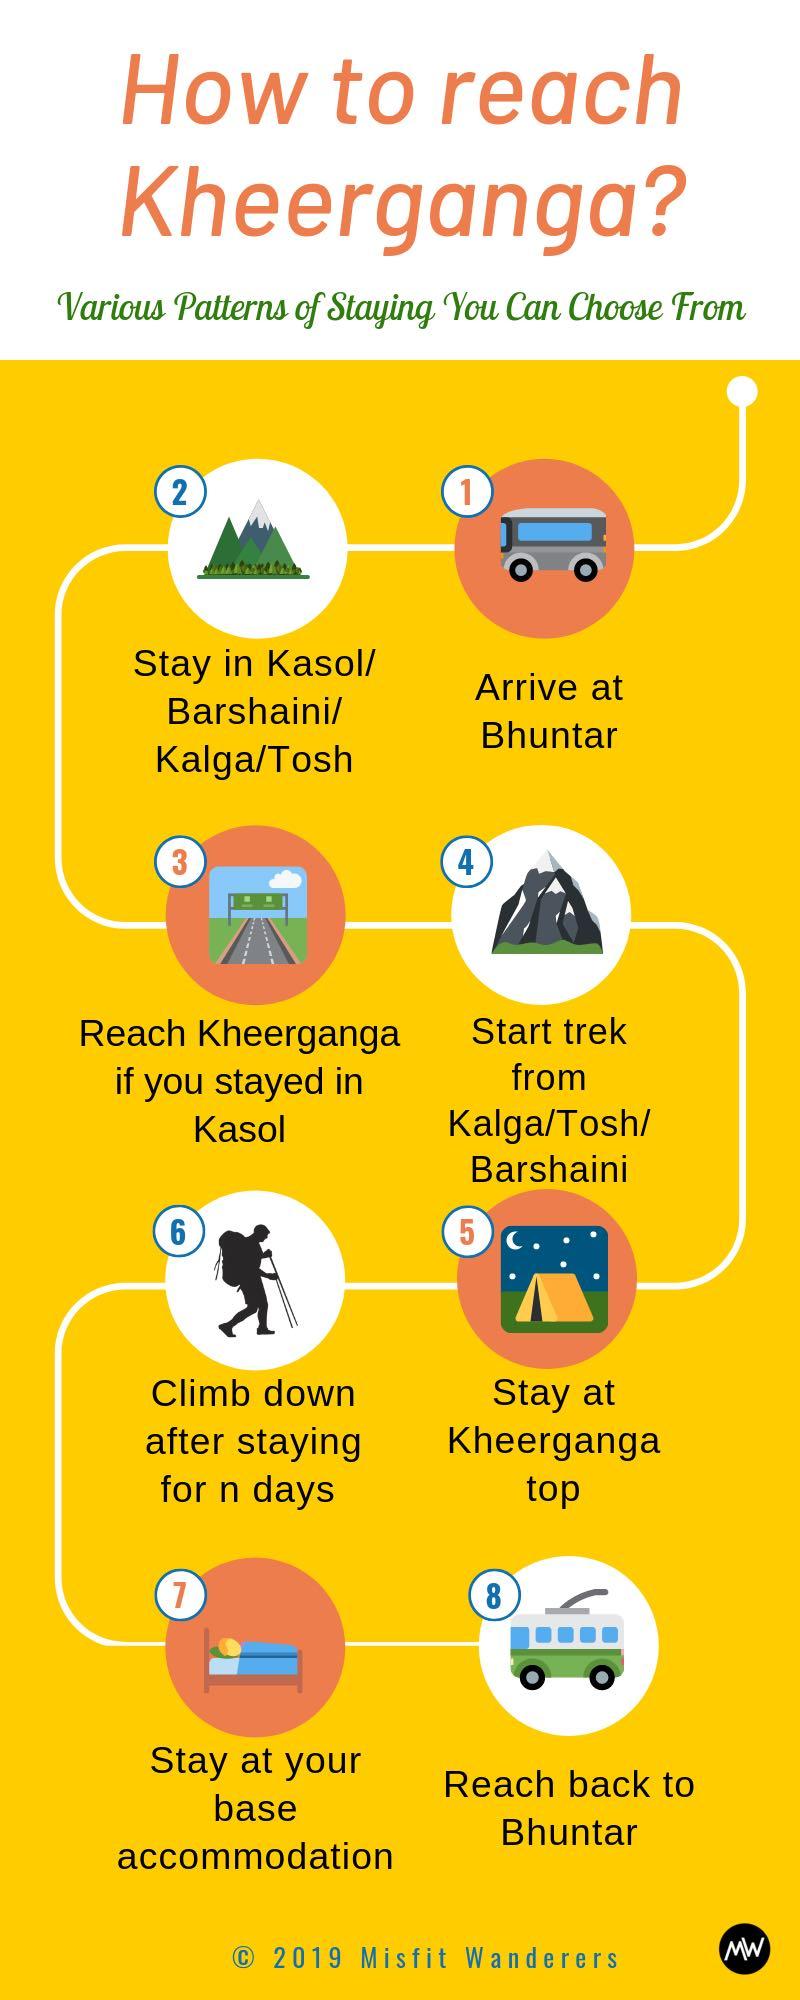 Kheerganga: Everything You Need To Know Before You Go 1